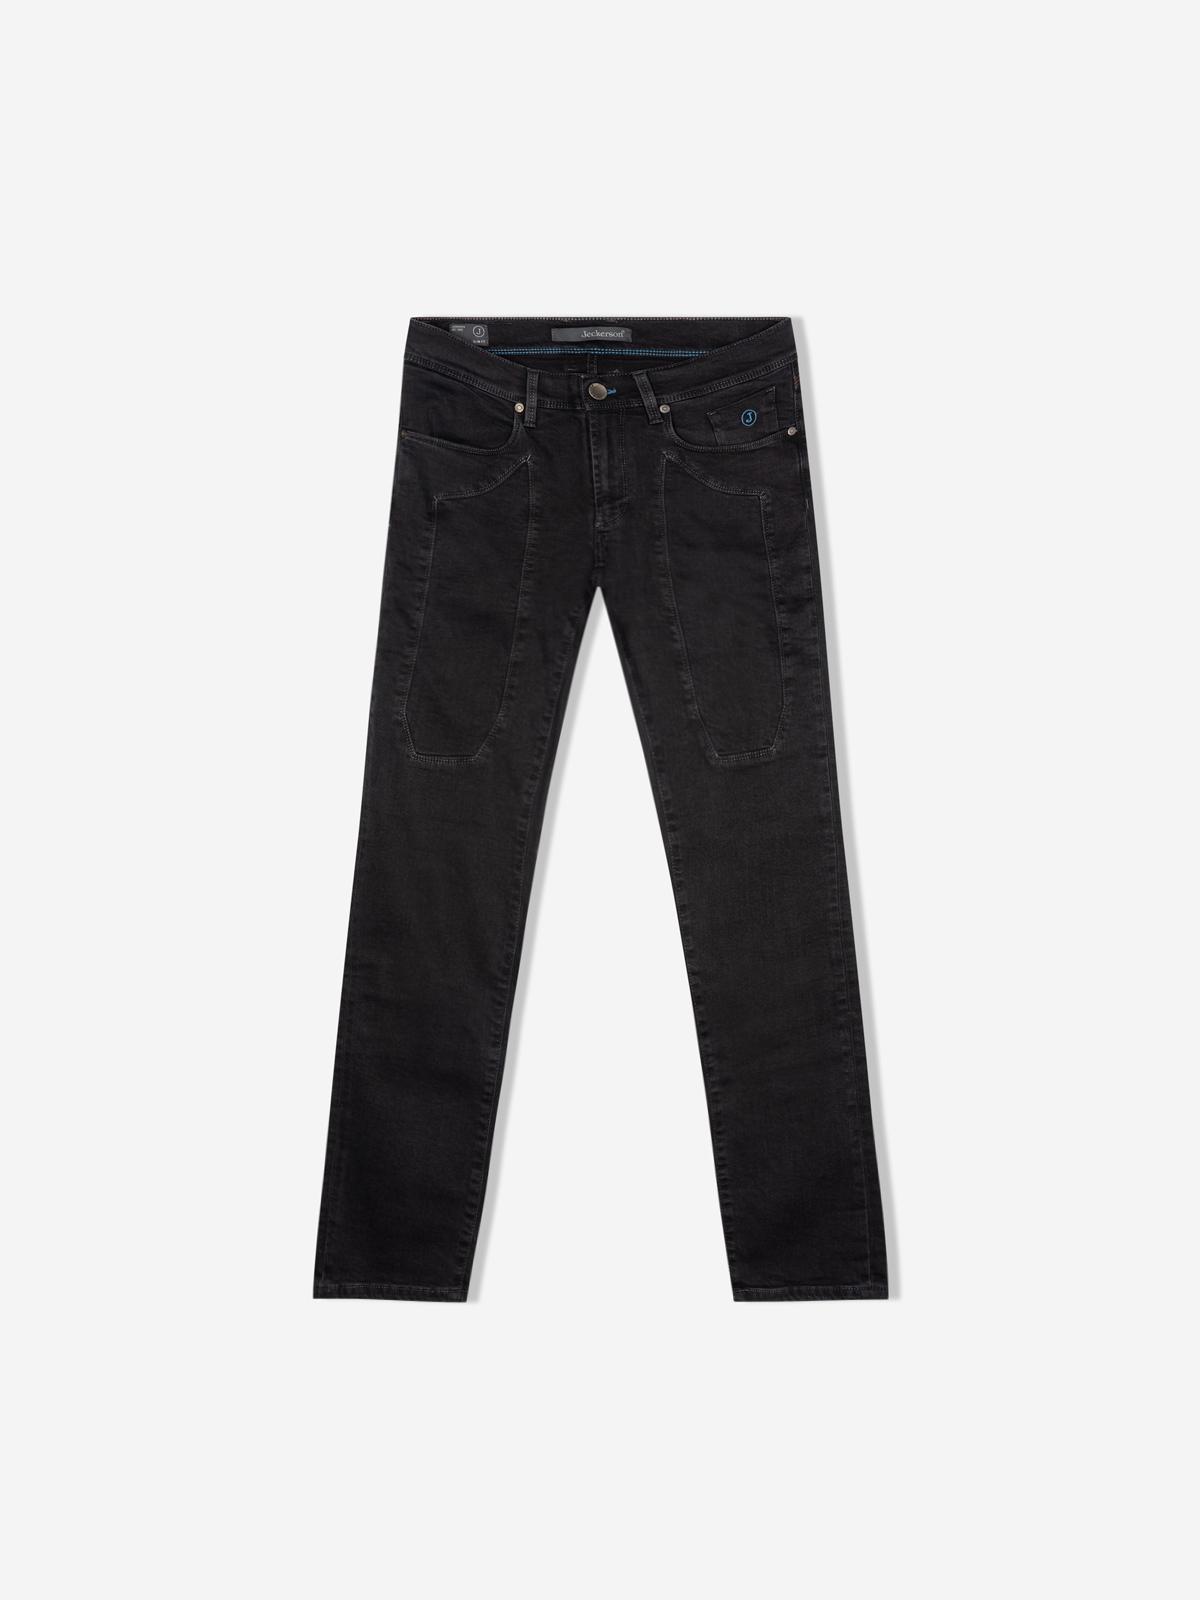 Jeans uomo JECKERSON ART.D777